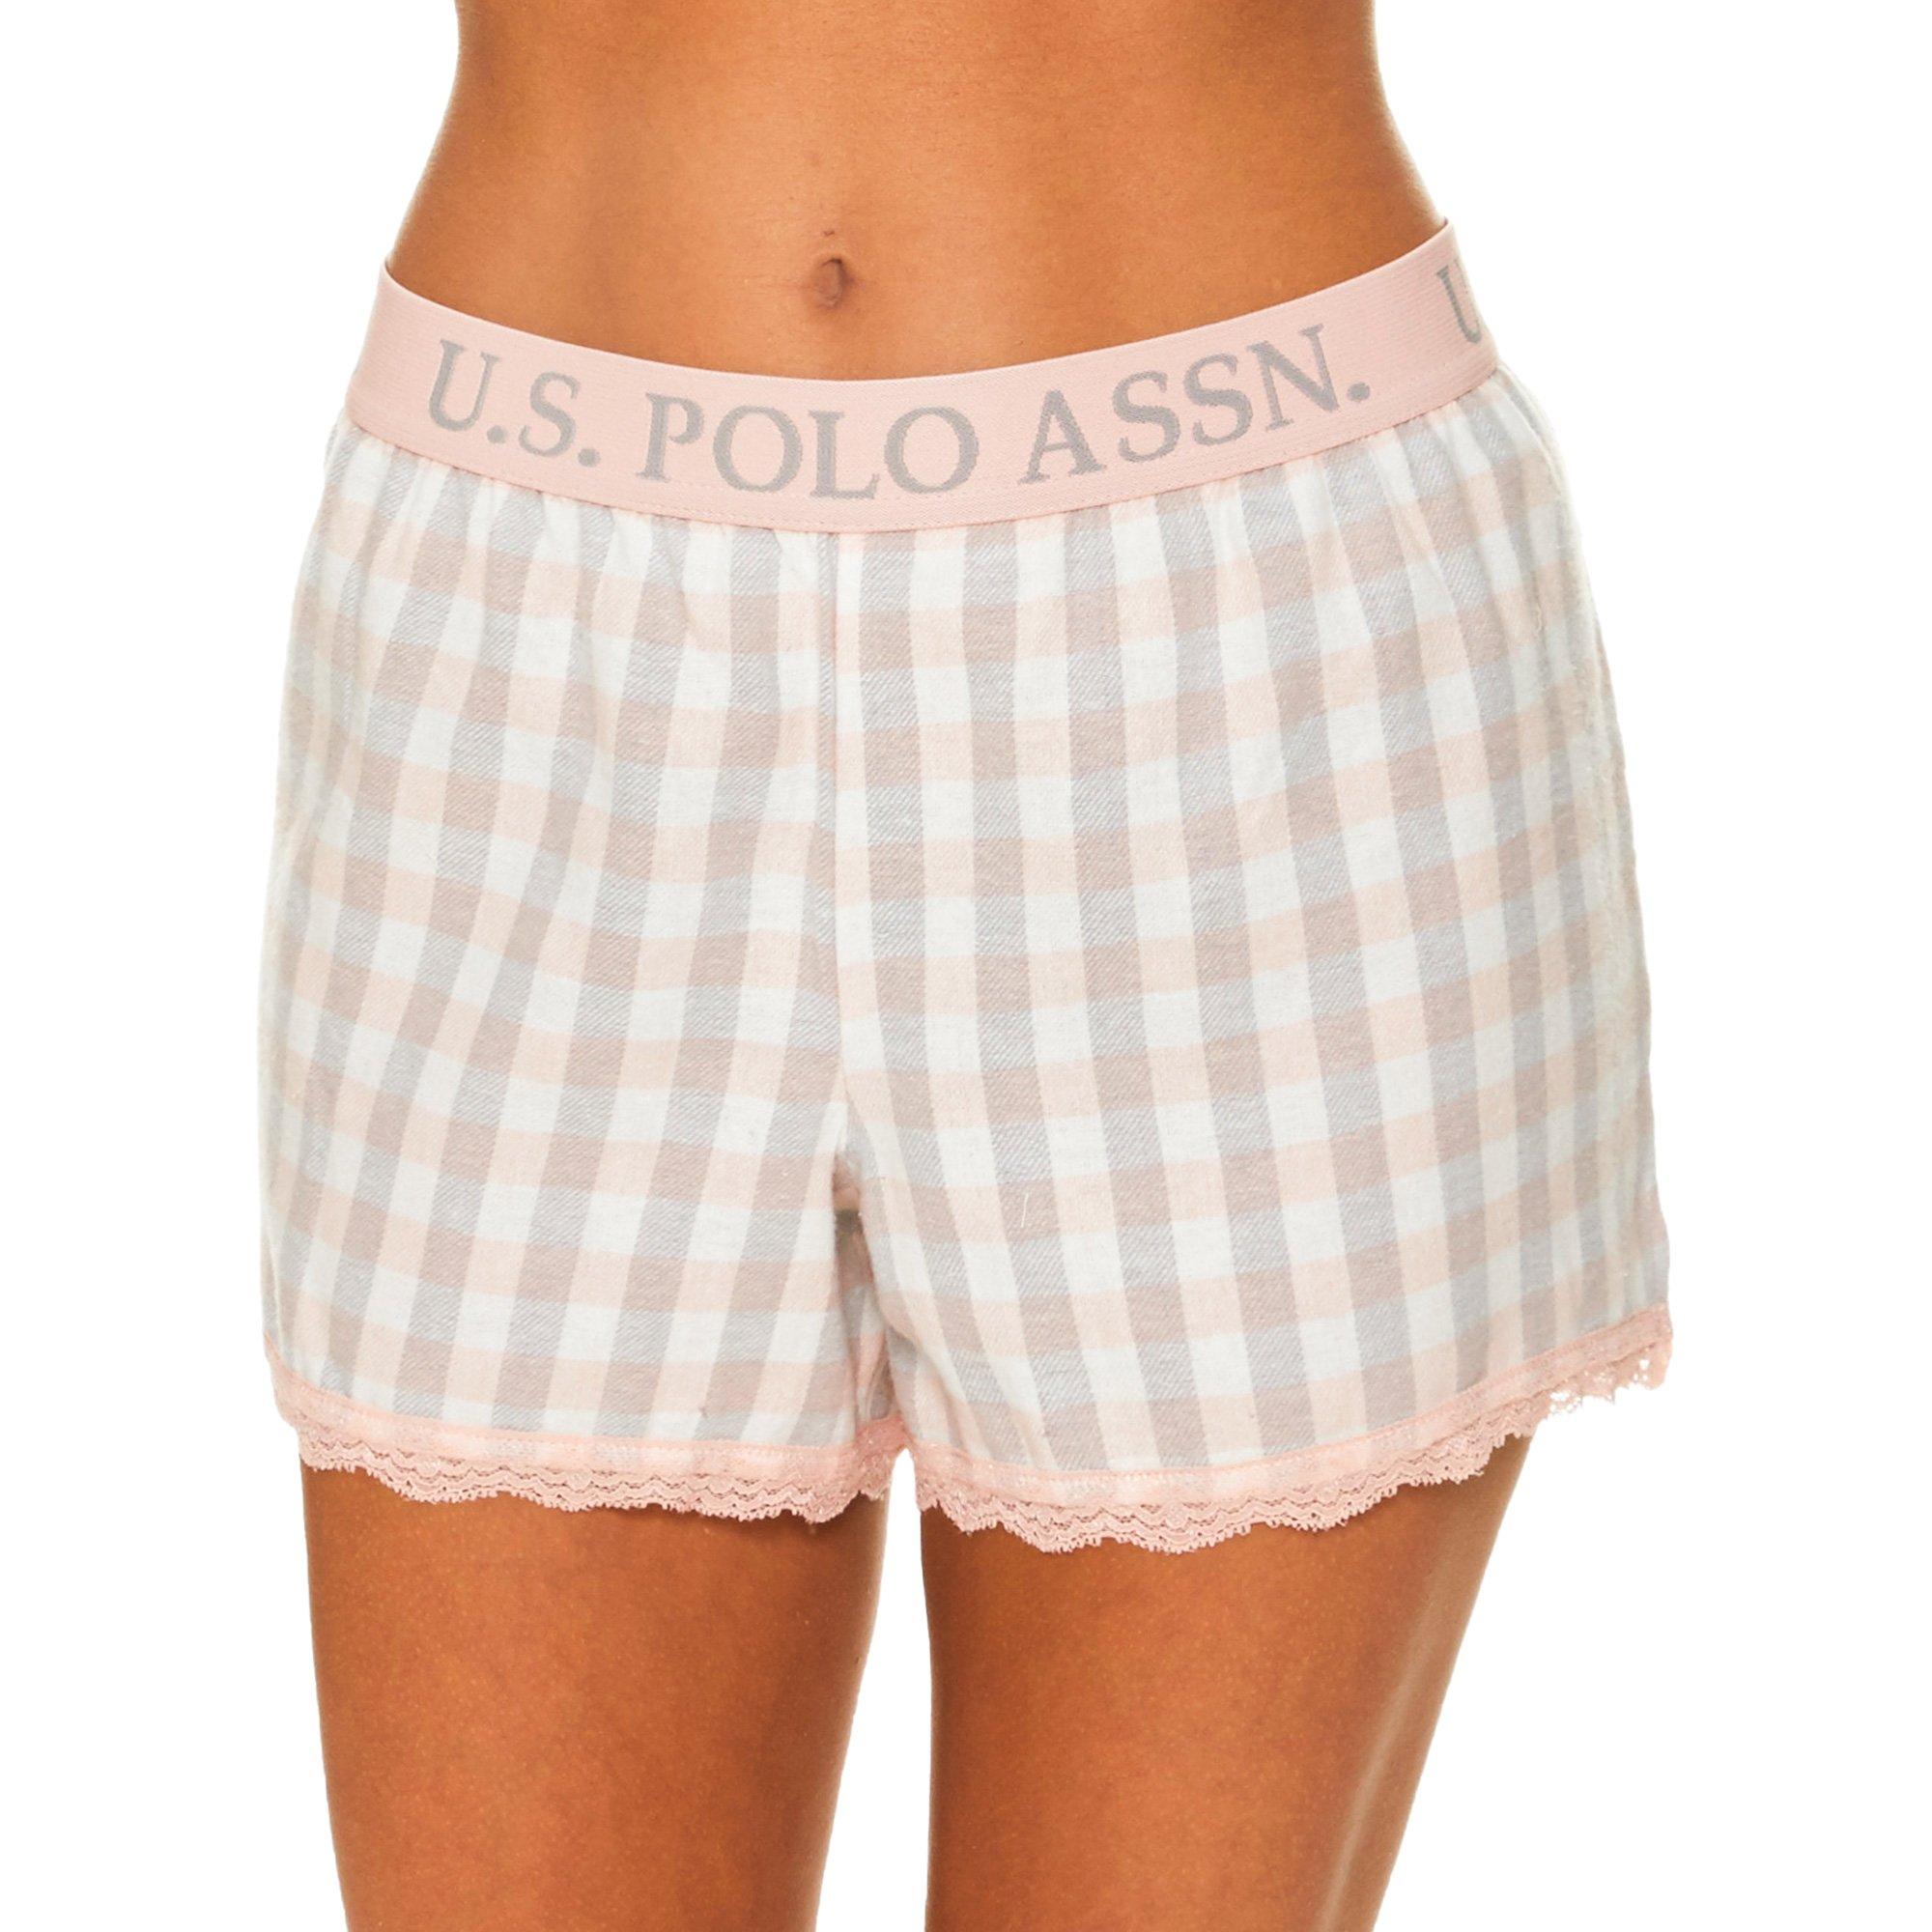 U.S. Polo Assn.. Womens Plaid Flannel Pajama Lounge Shorts with Lace Trim Light Peach Large